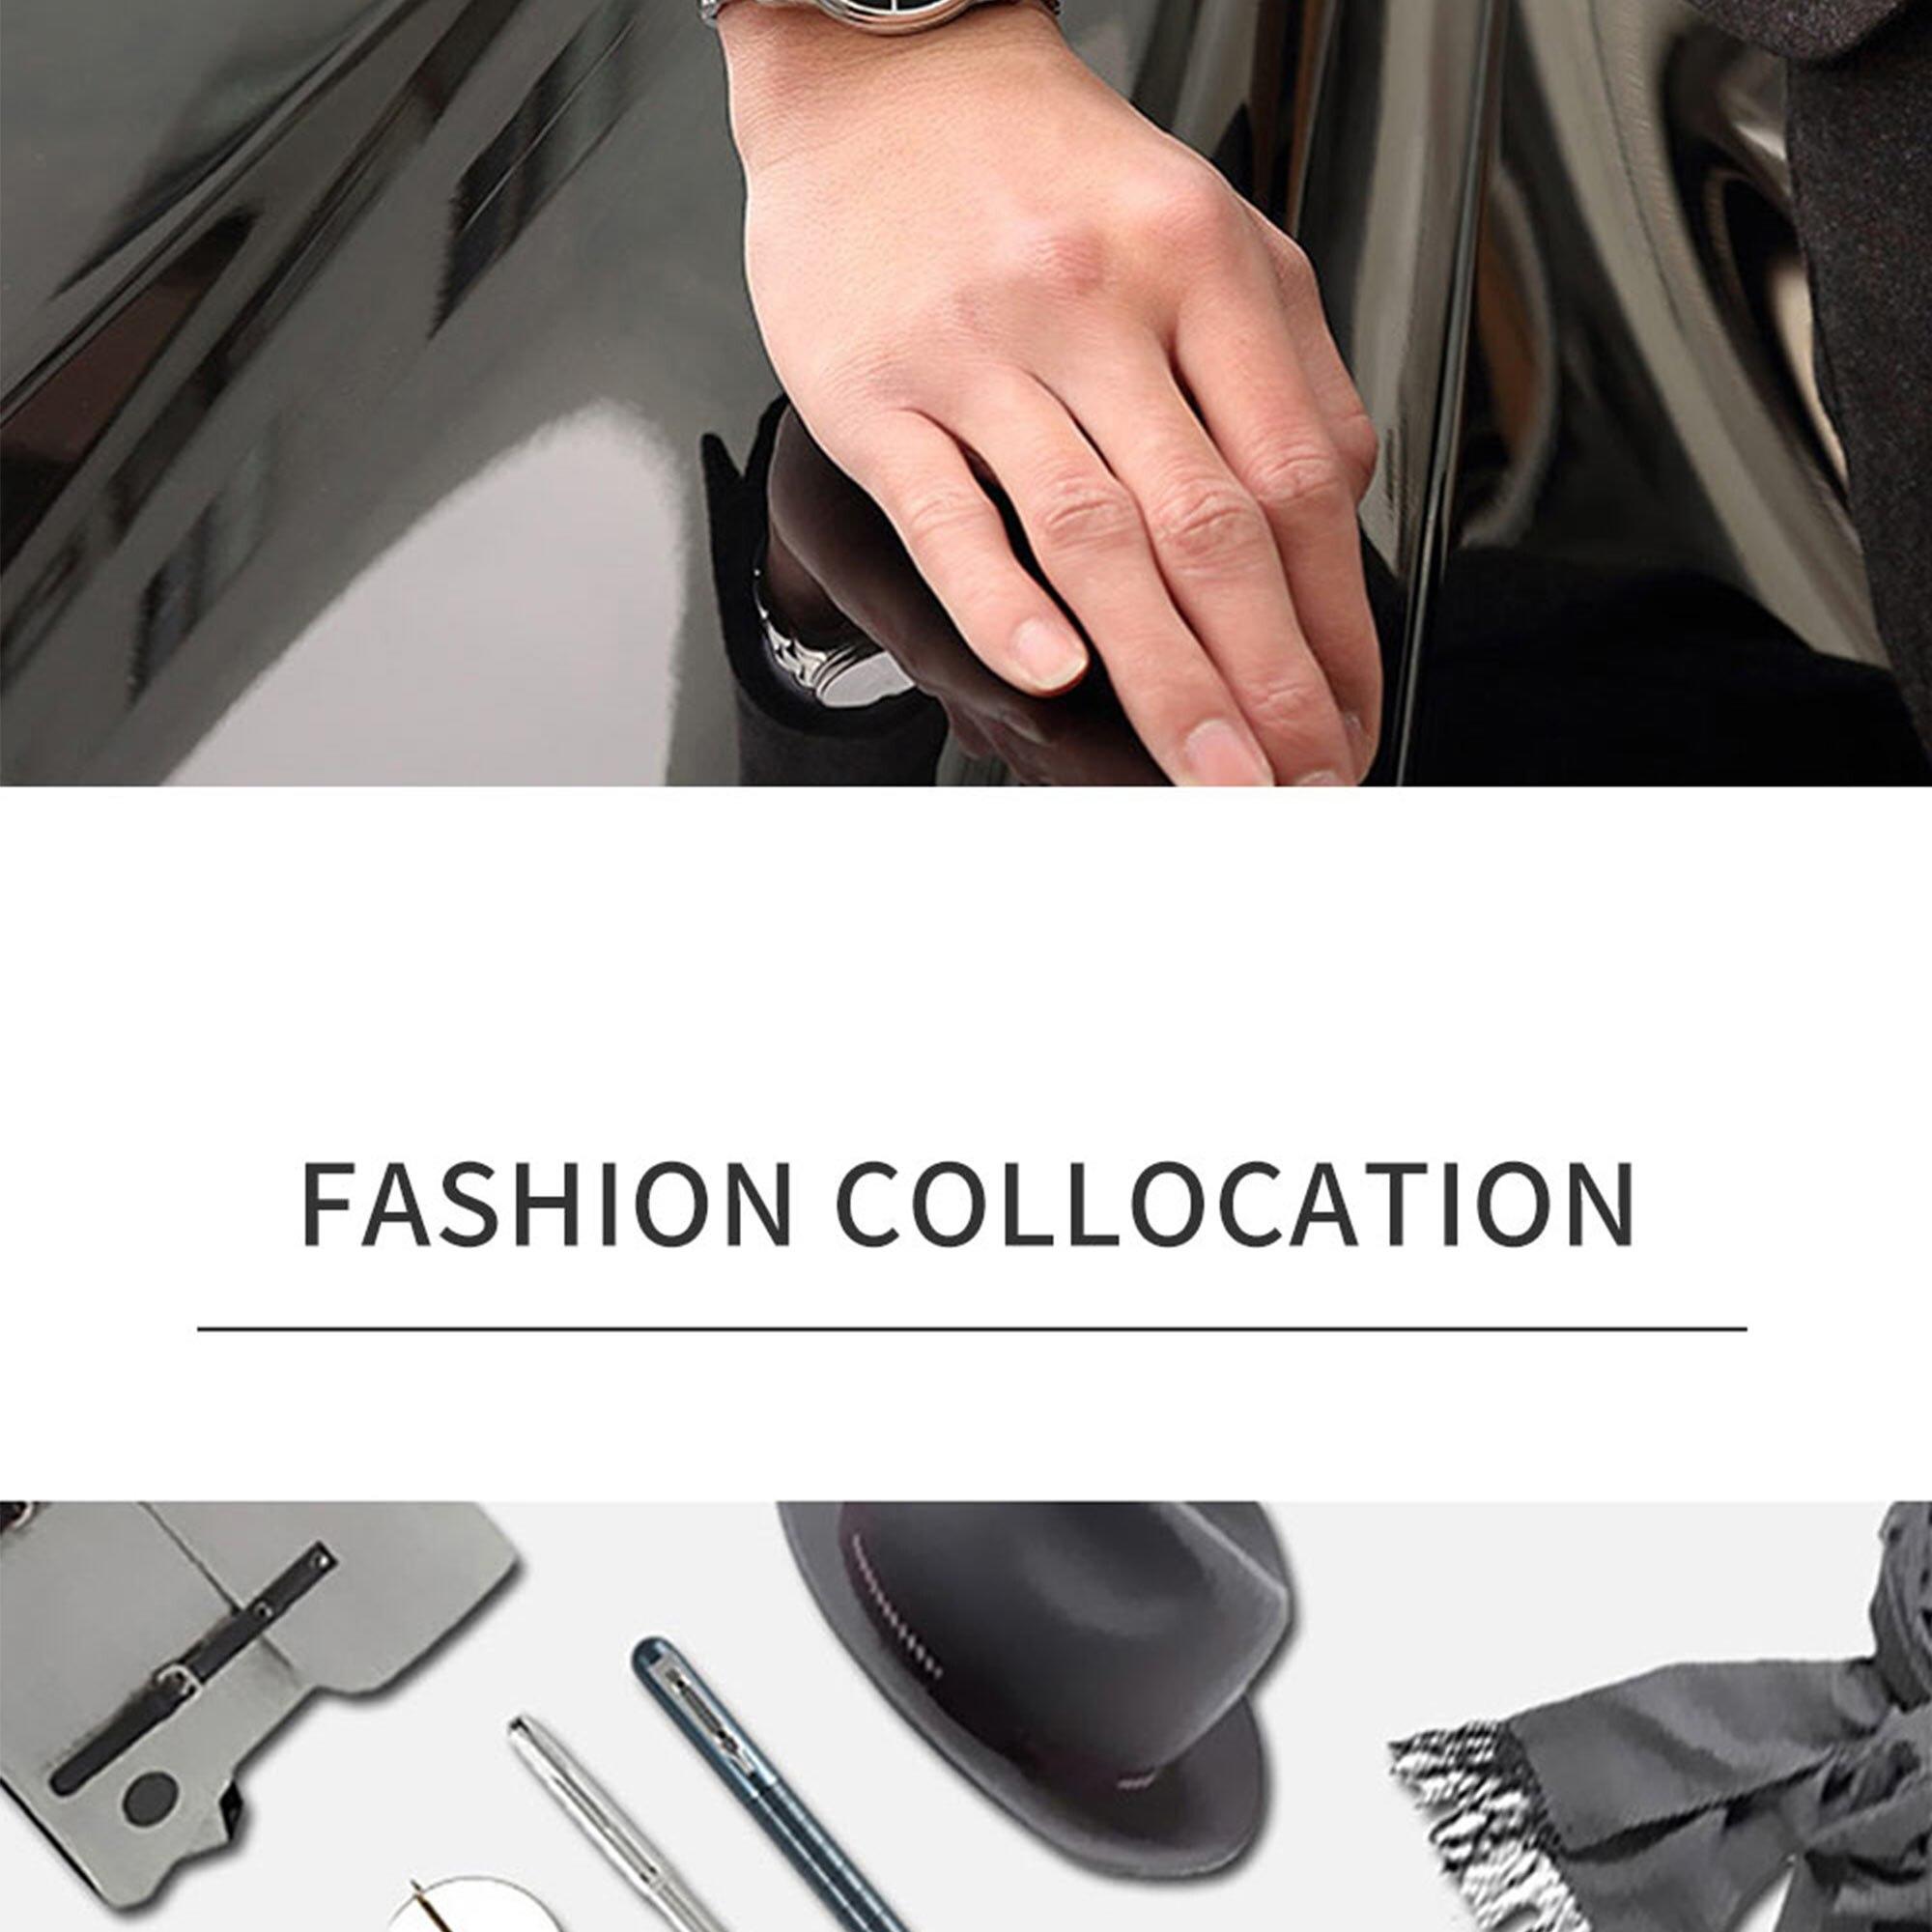 H13a87bcc31d34a22a1d007fd2c4316b2q CADISEN Men Watch Automatic Mechanical Watches Role Date Week Top Luxury Brand Japan NH36A Wrist watch Clock Relogio Masculino